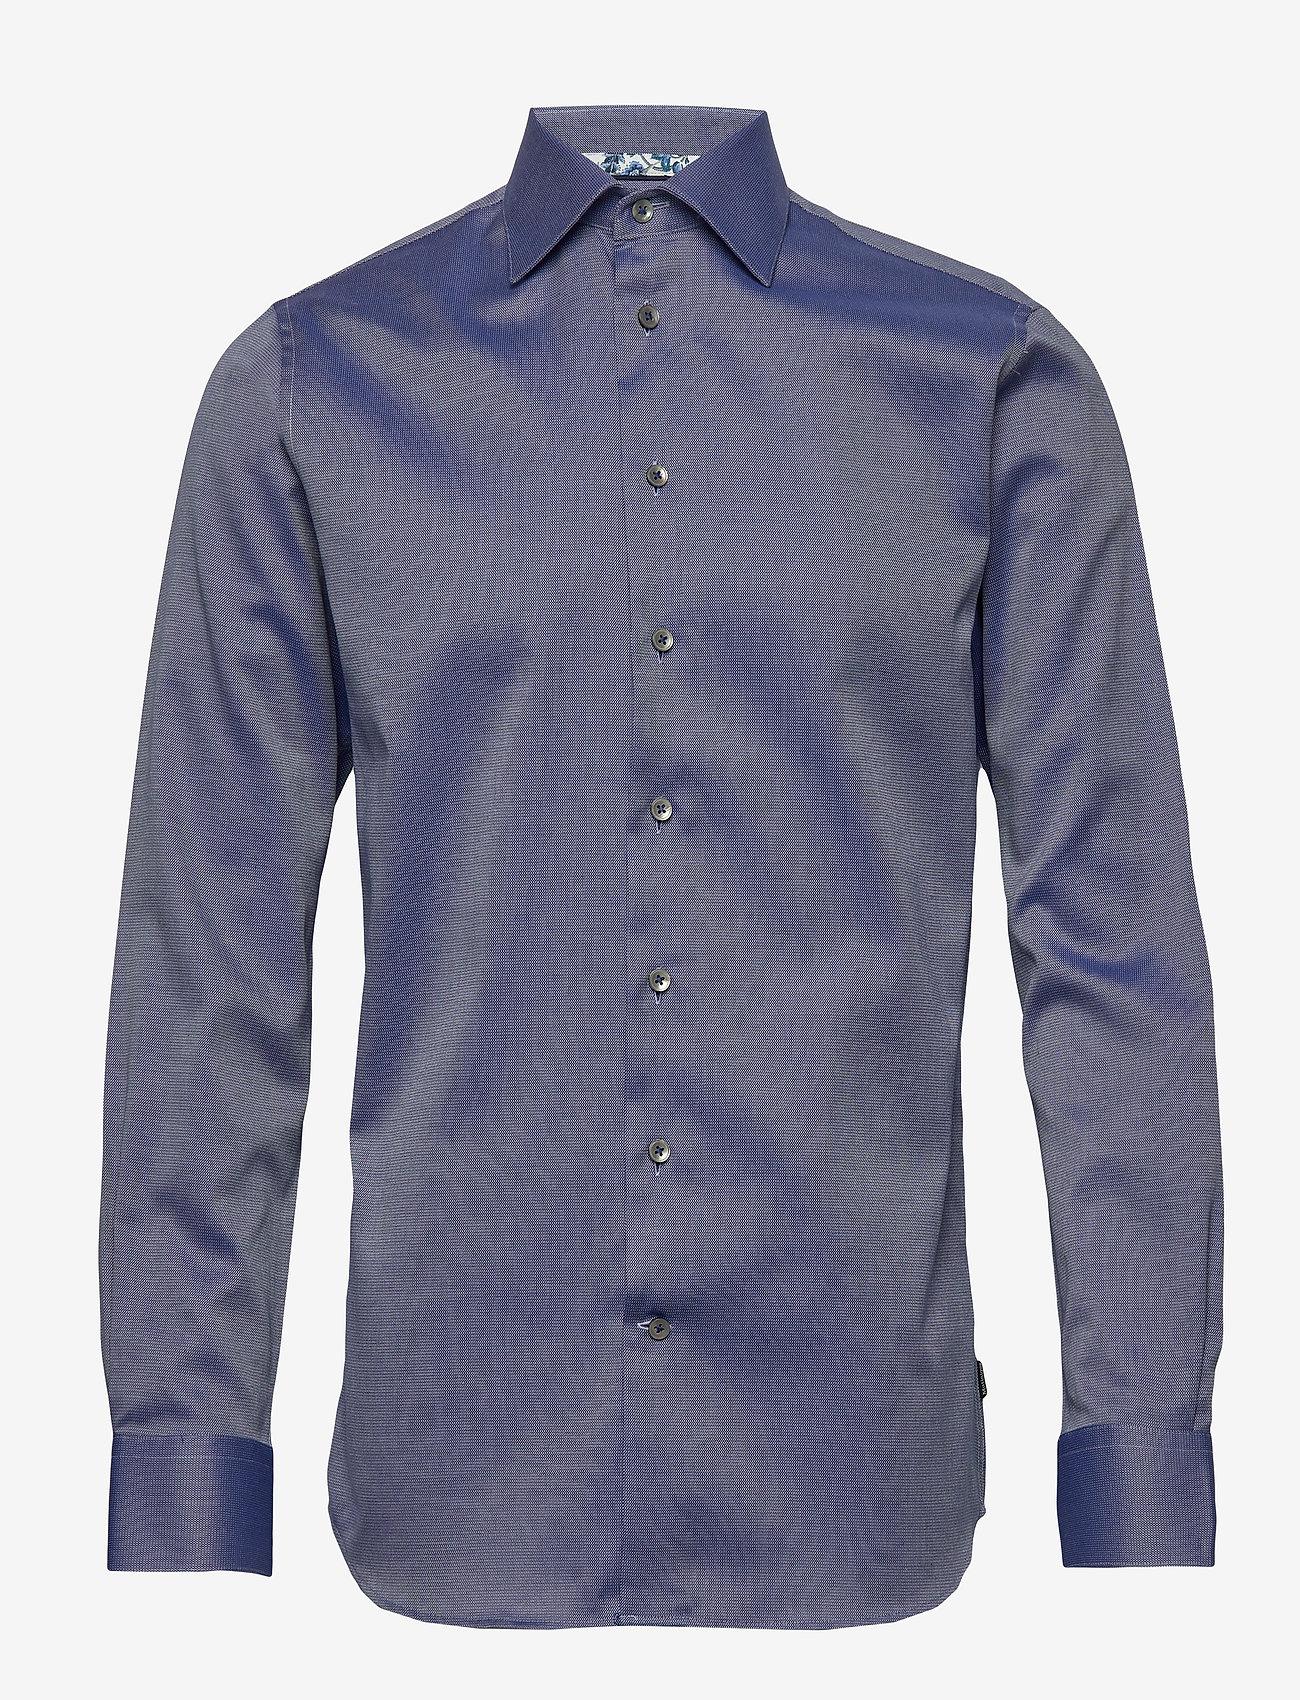 Matinique Marc - Chemises INK BLUE LVYeYc2r